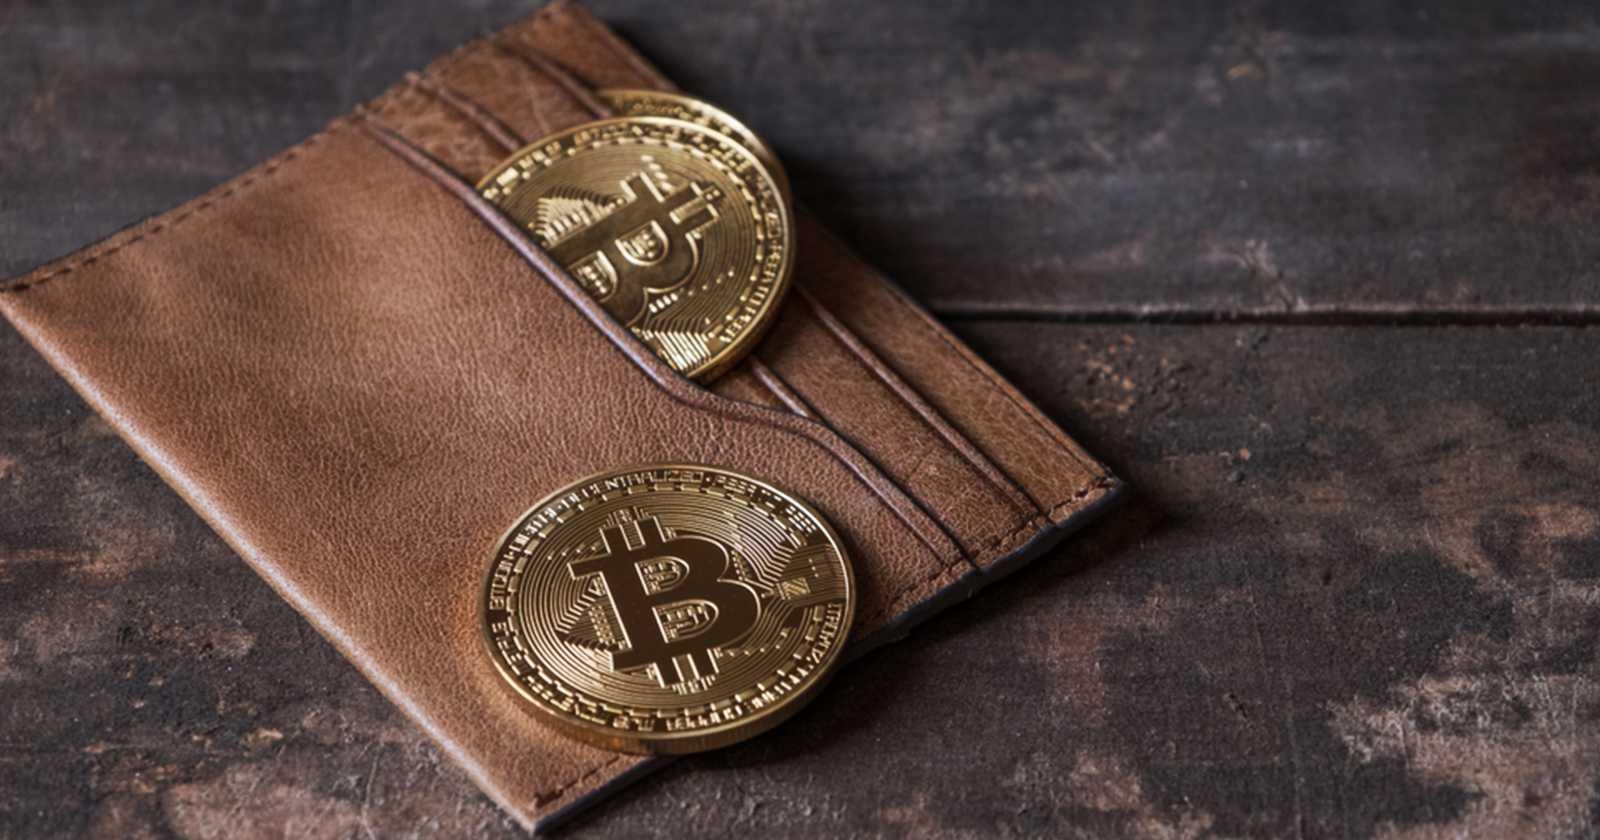 kripto para ödeme sistemi